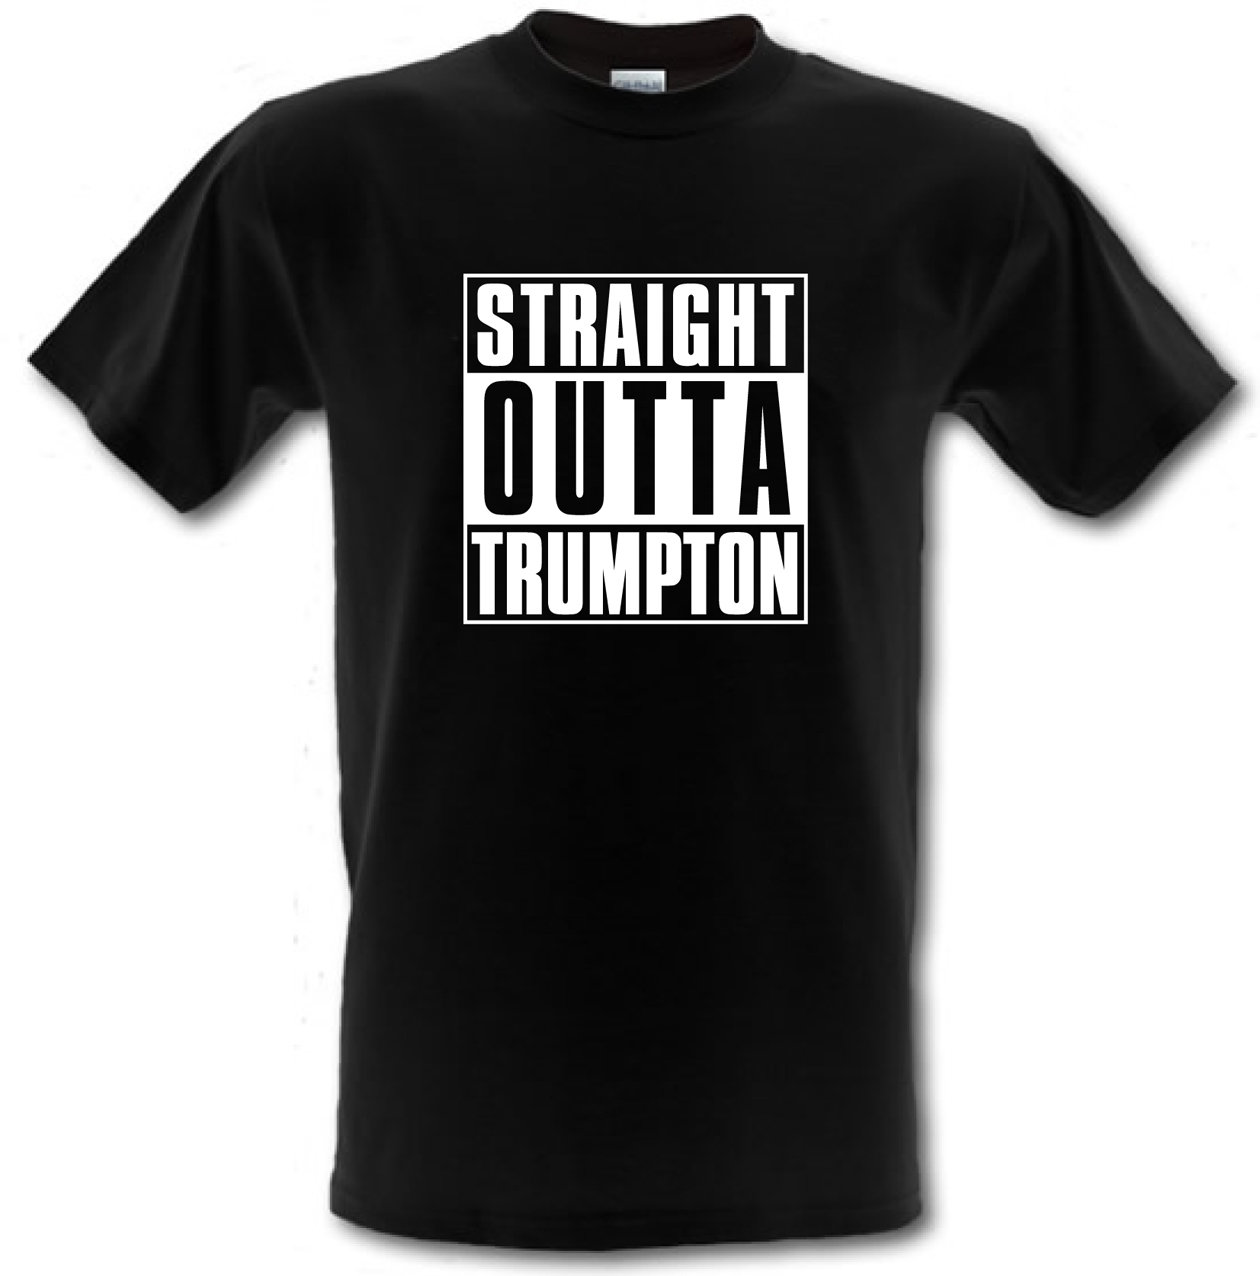 STRAIGHT OUTTA TRUMPTON